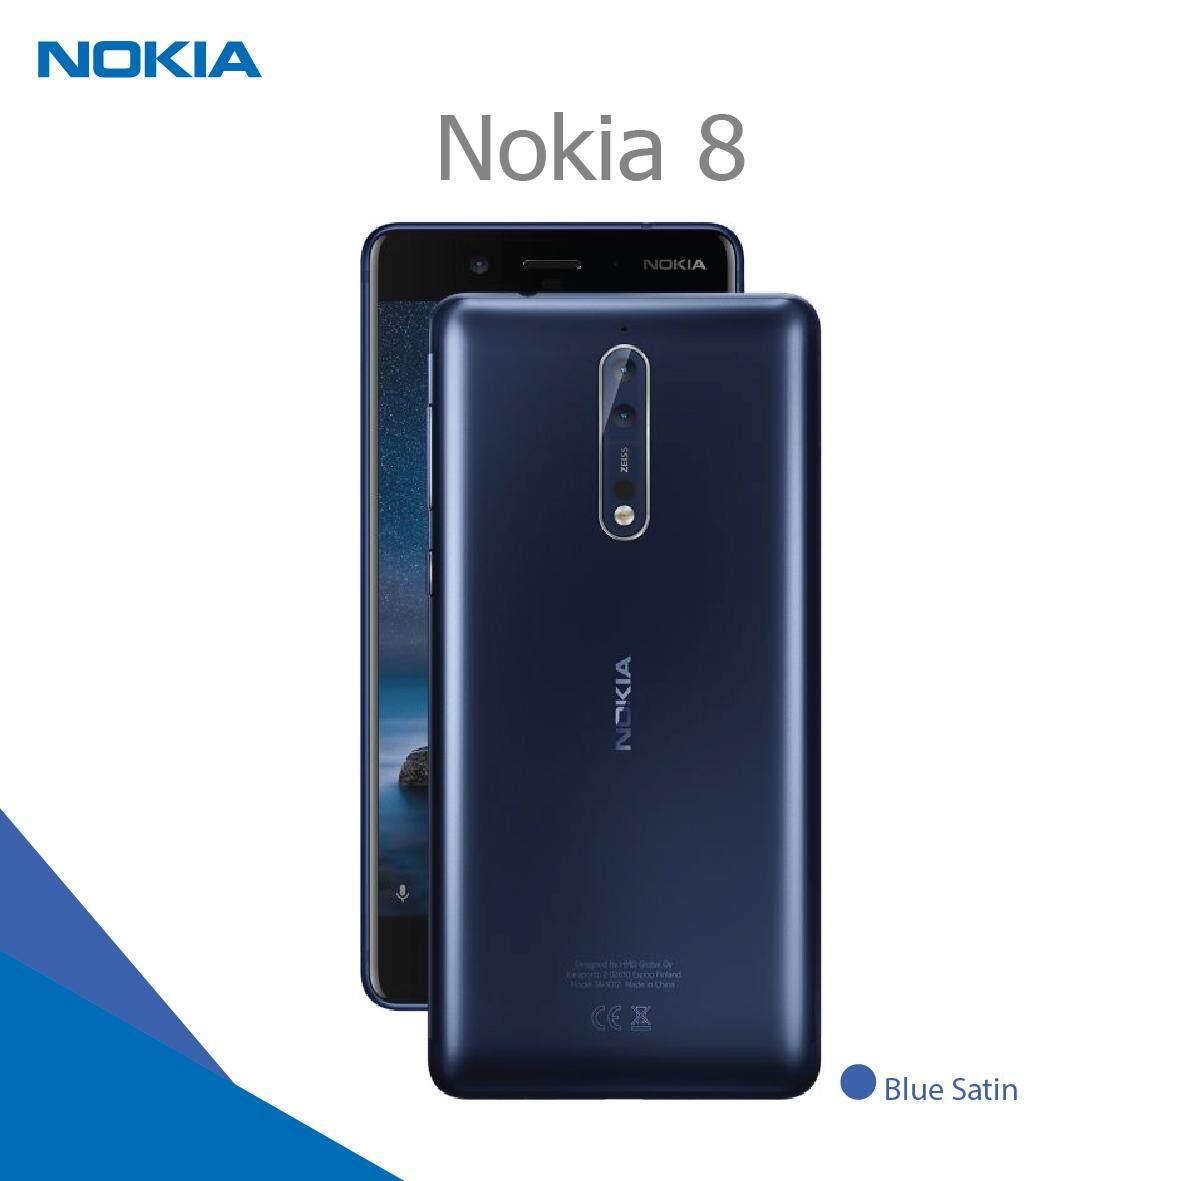 Nokia 8 DualSim Ram 4GB / Rom 64GB